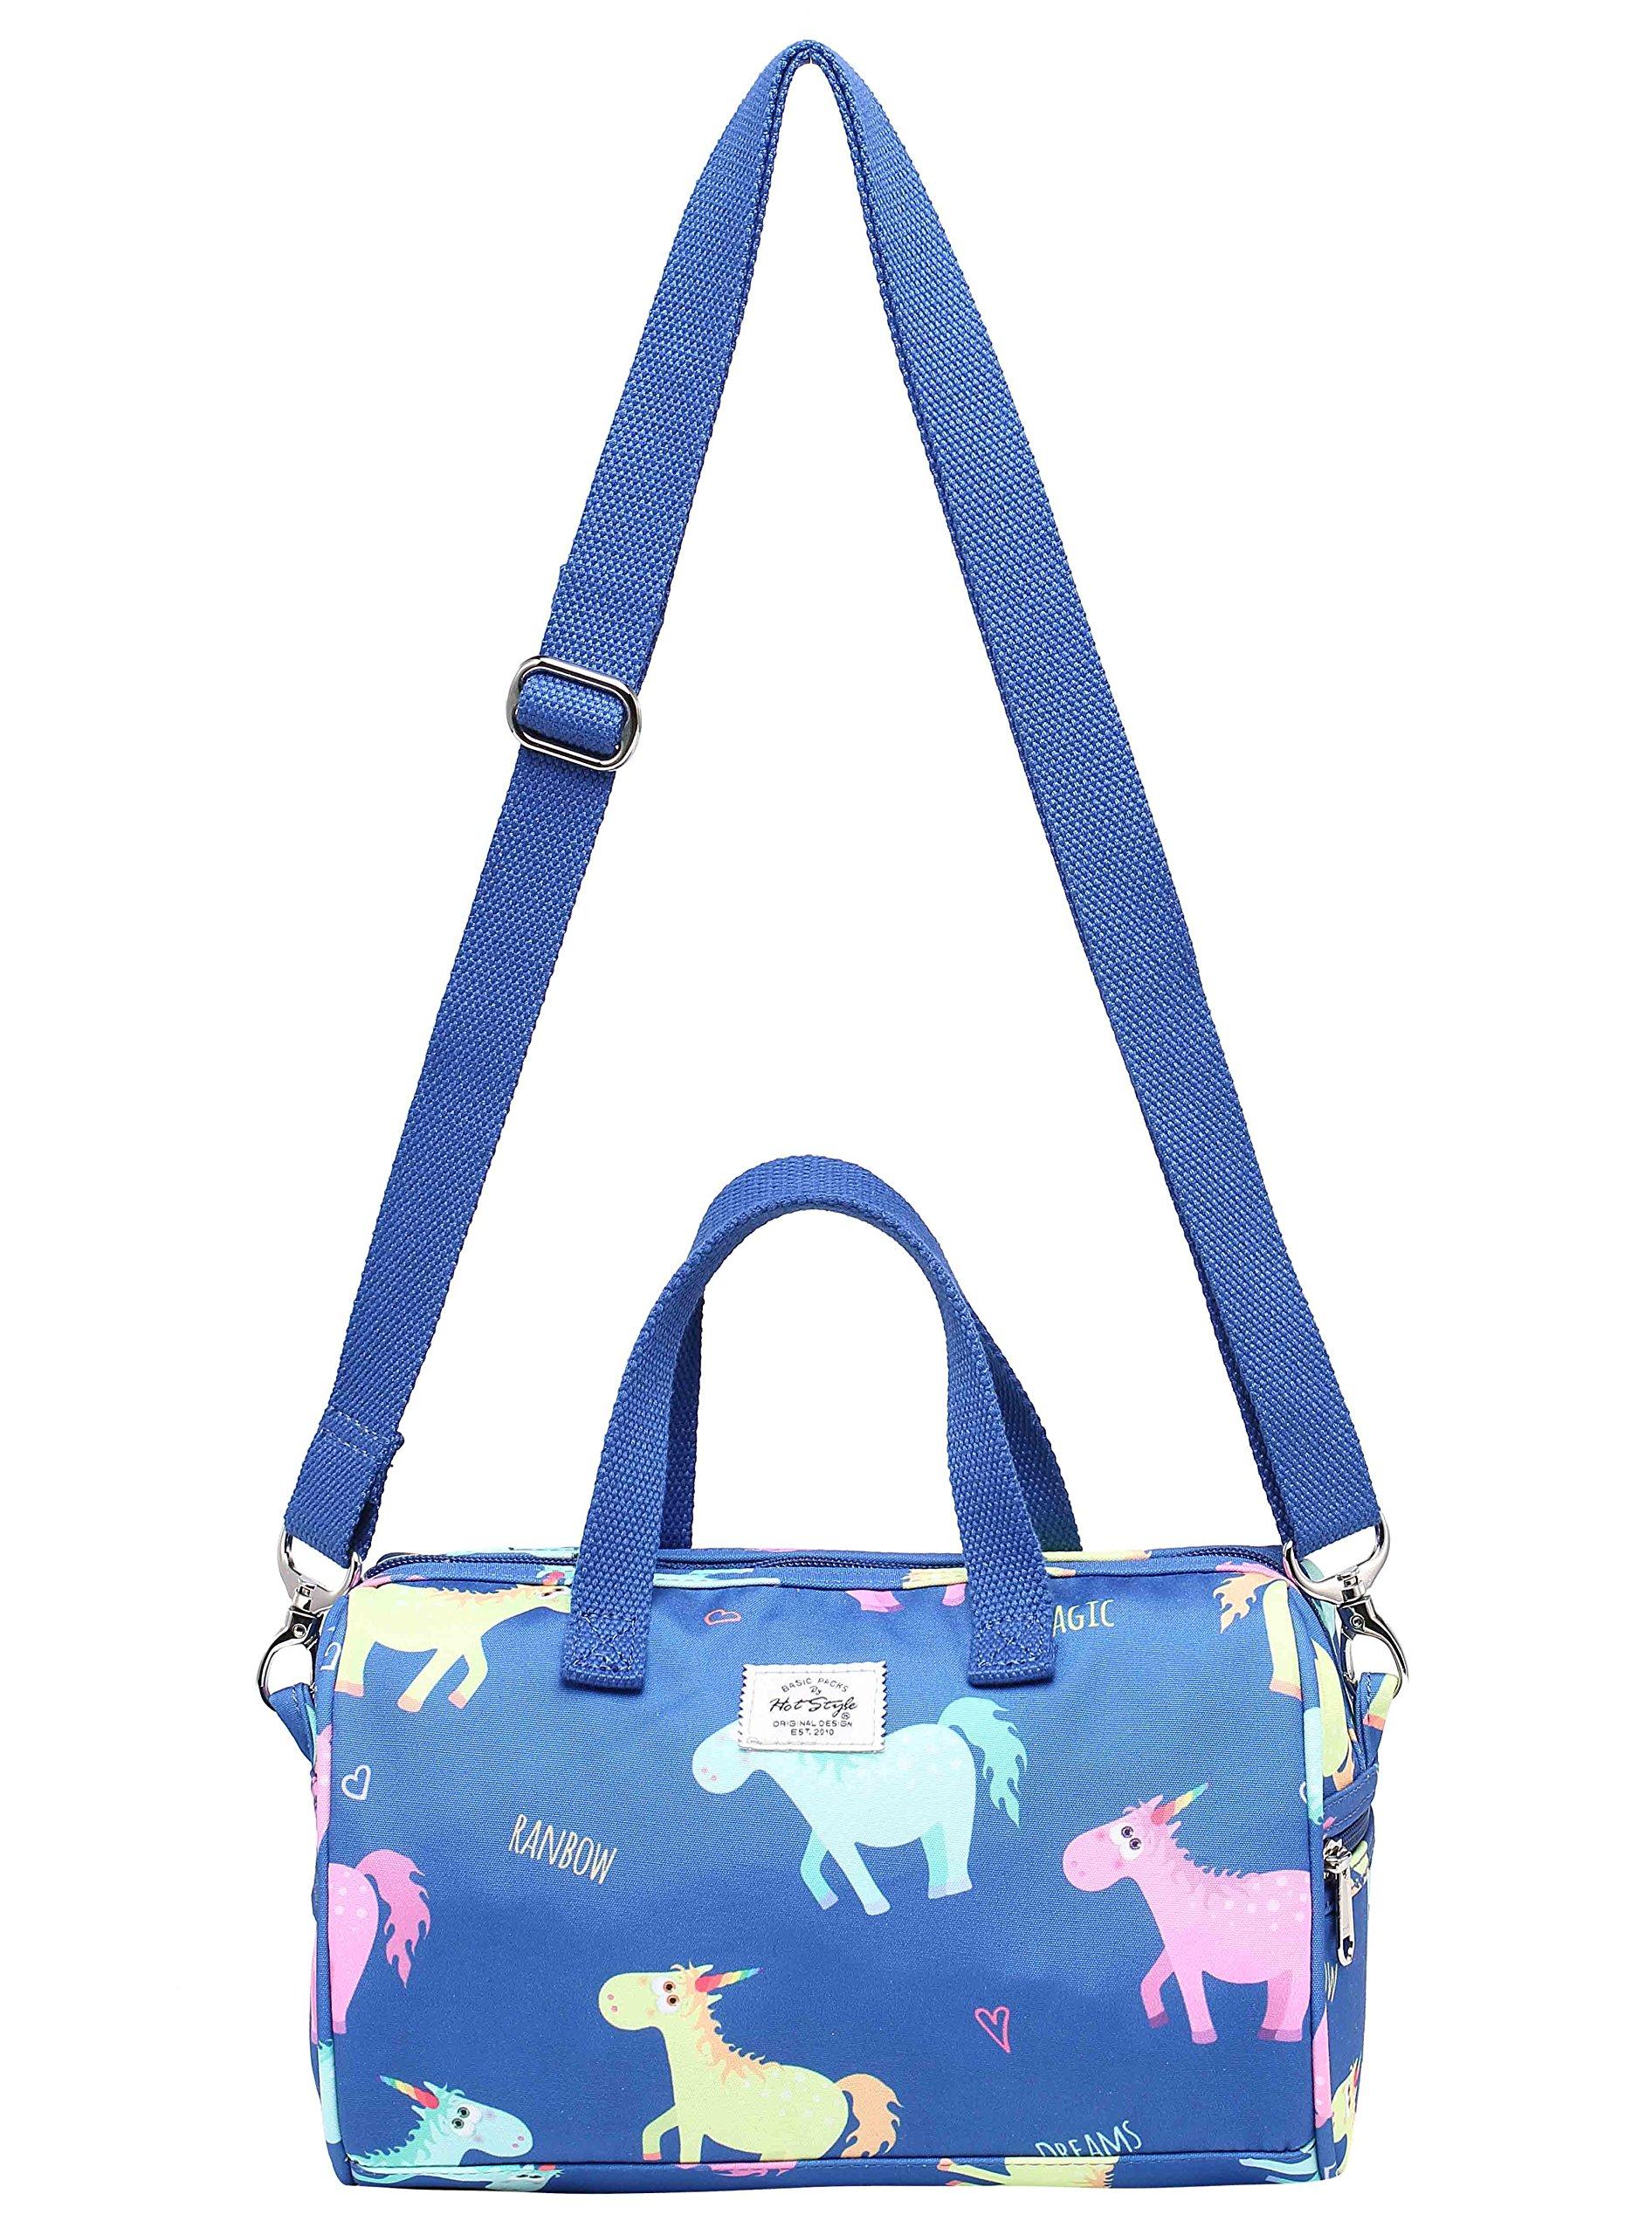 MIETTE Girls Mini Crossbody Shoulder Bag Small Handbag | 9.4''x6.2''x4.7'' | Unicorns, Blue